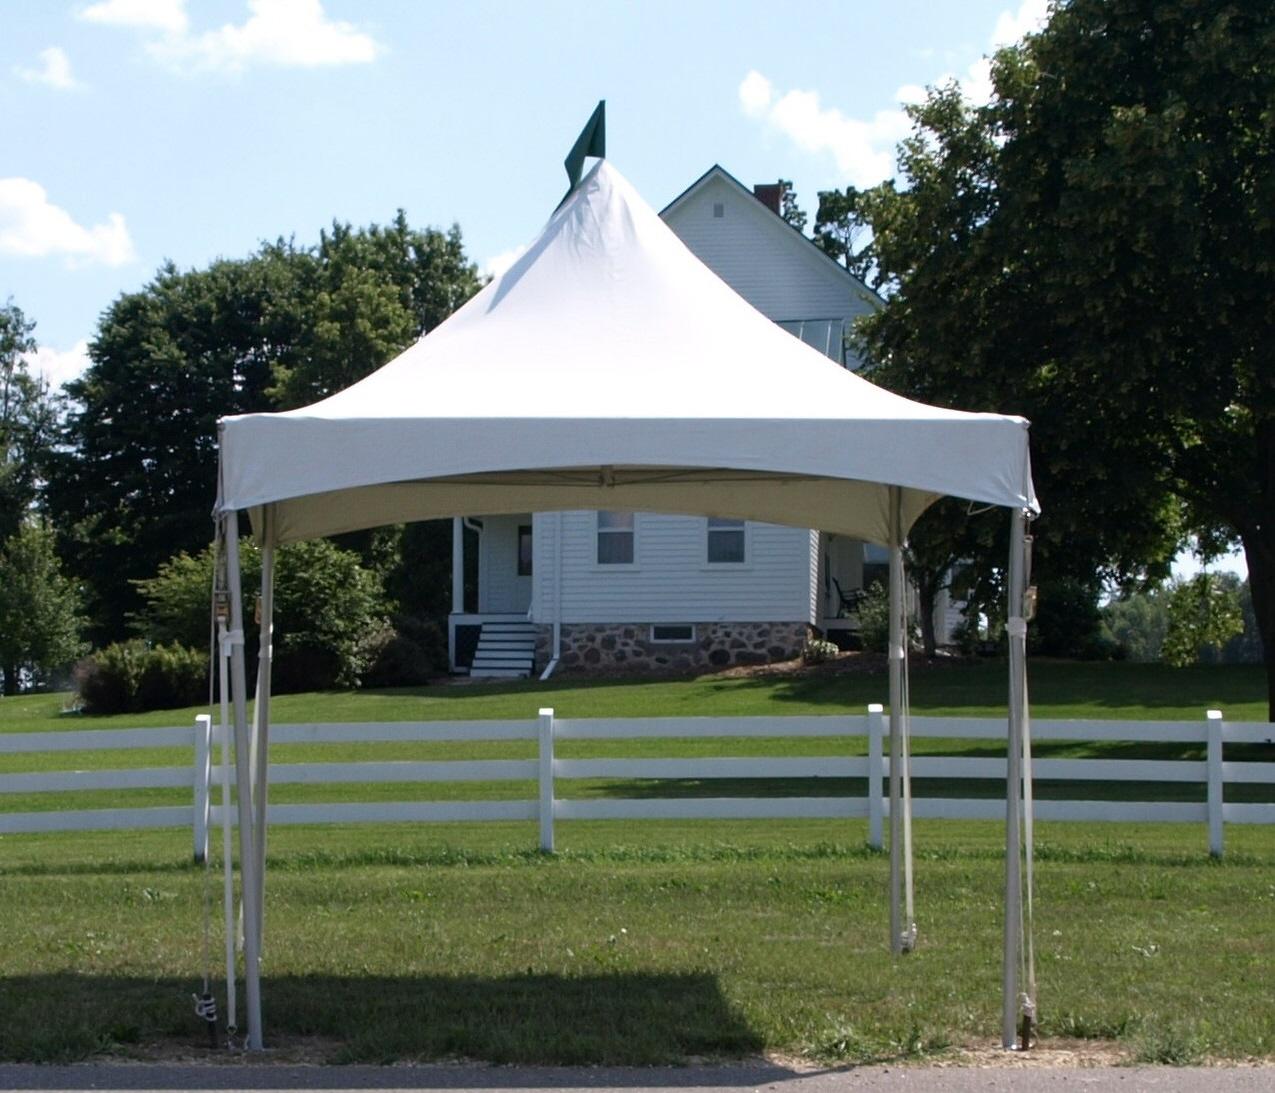 10 x 10 High Peak Frame Tent